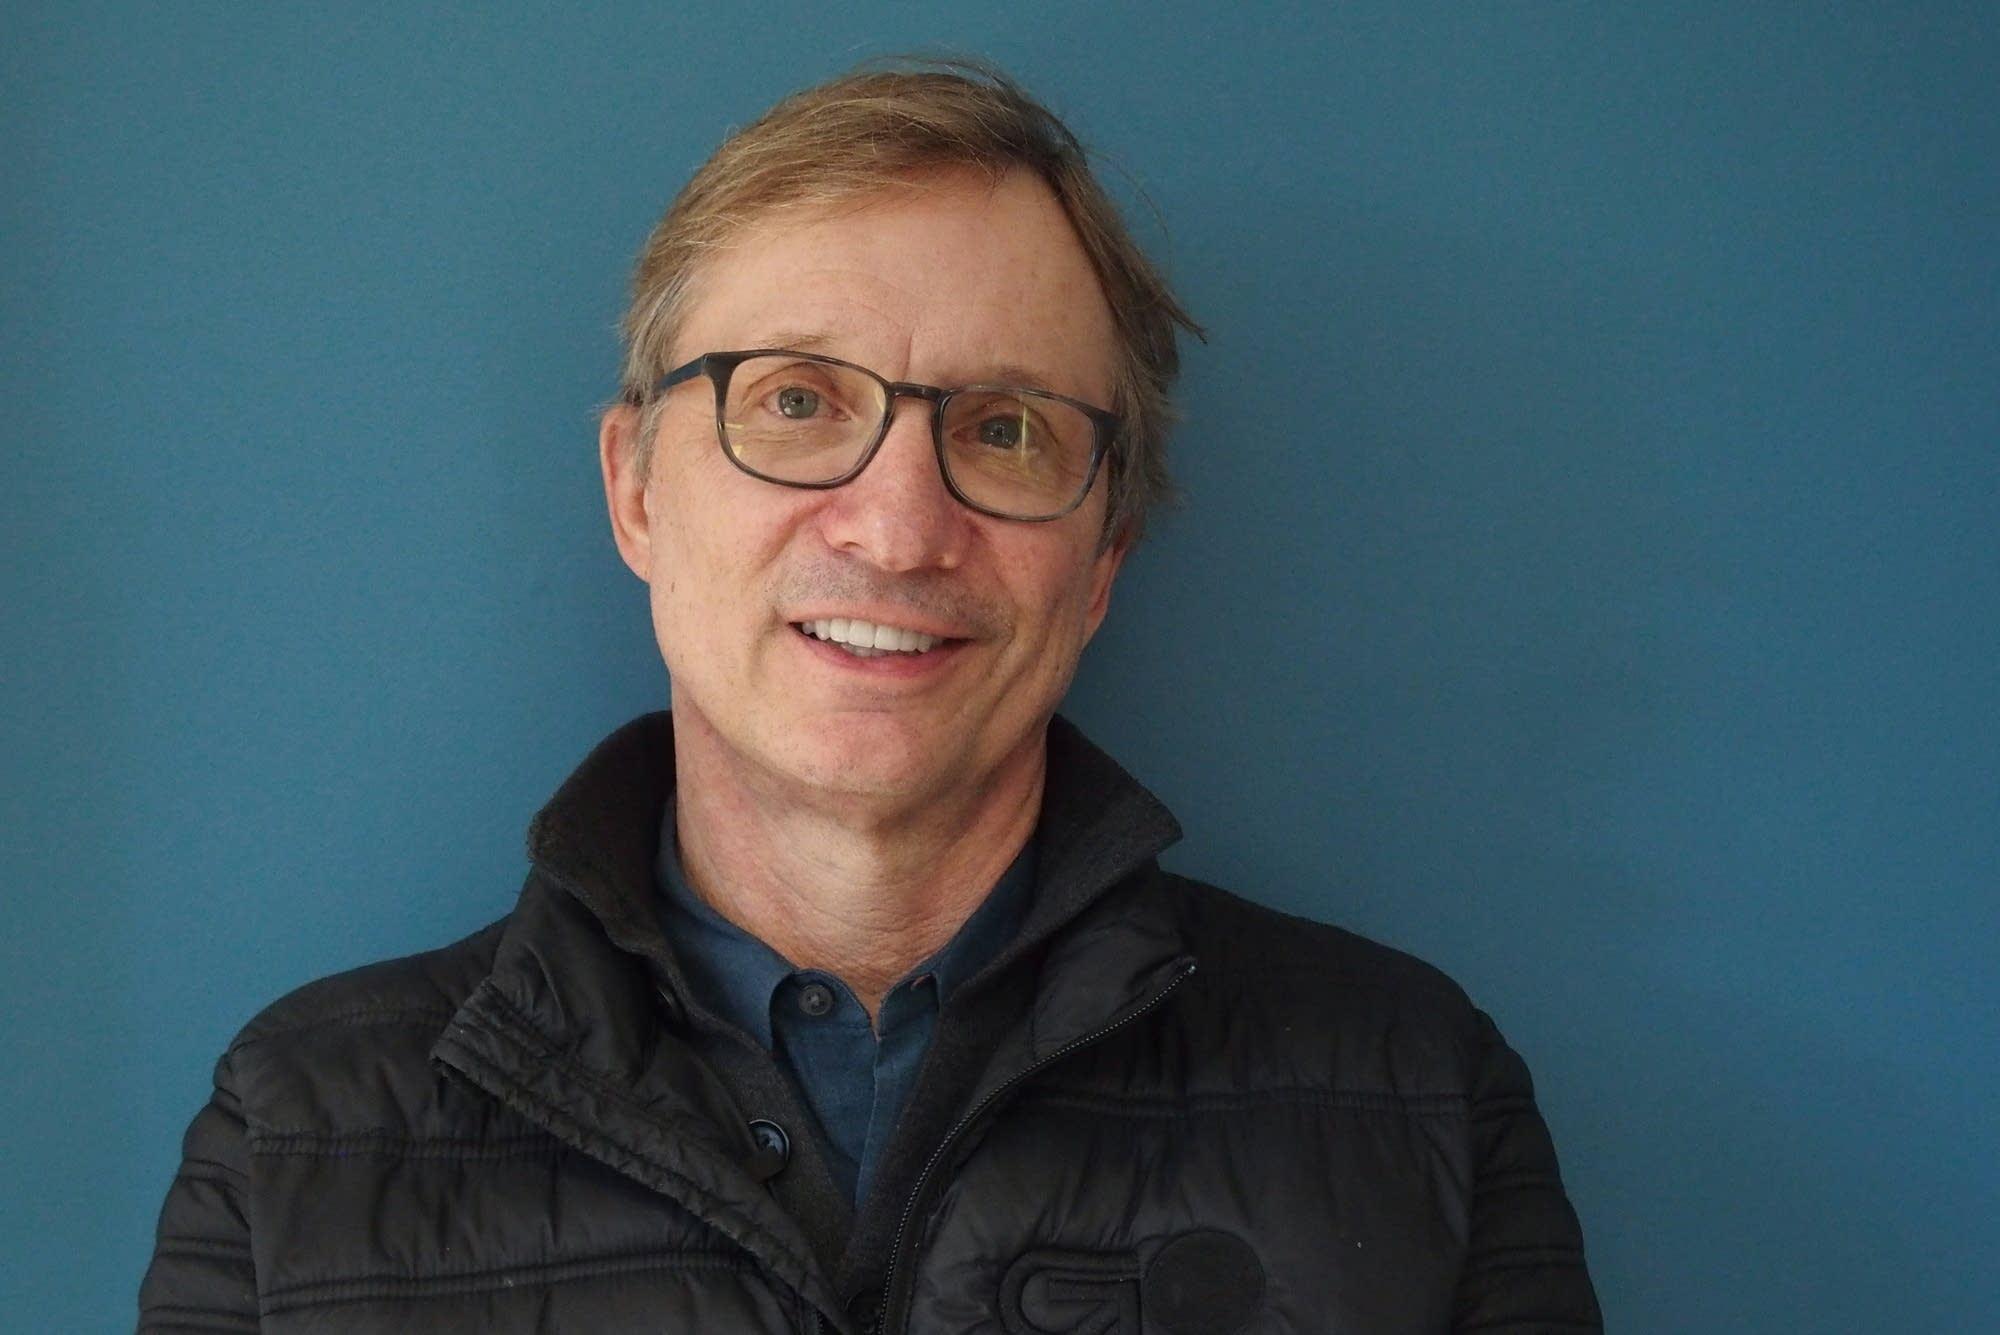 Producer Jim Burke